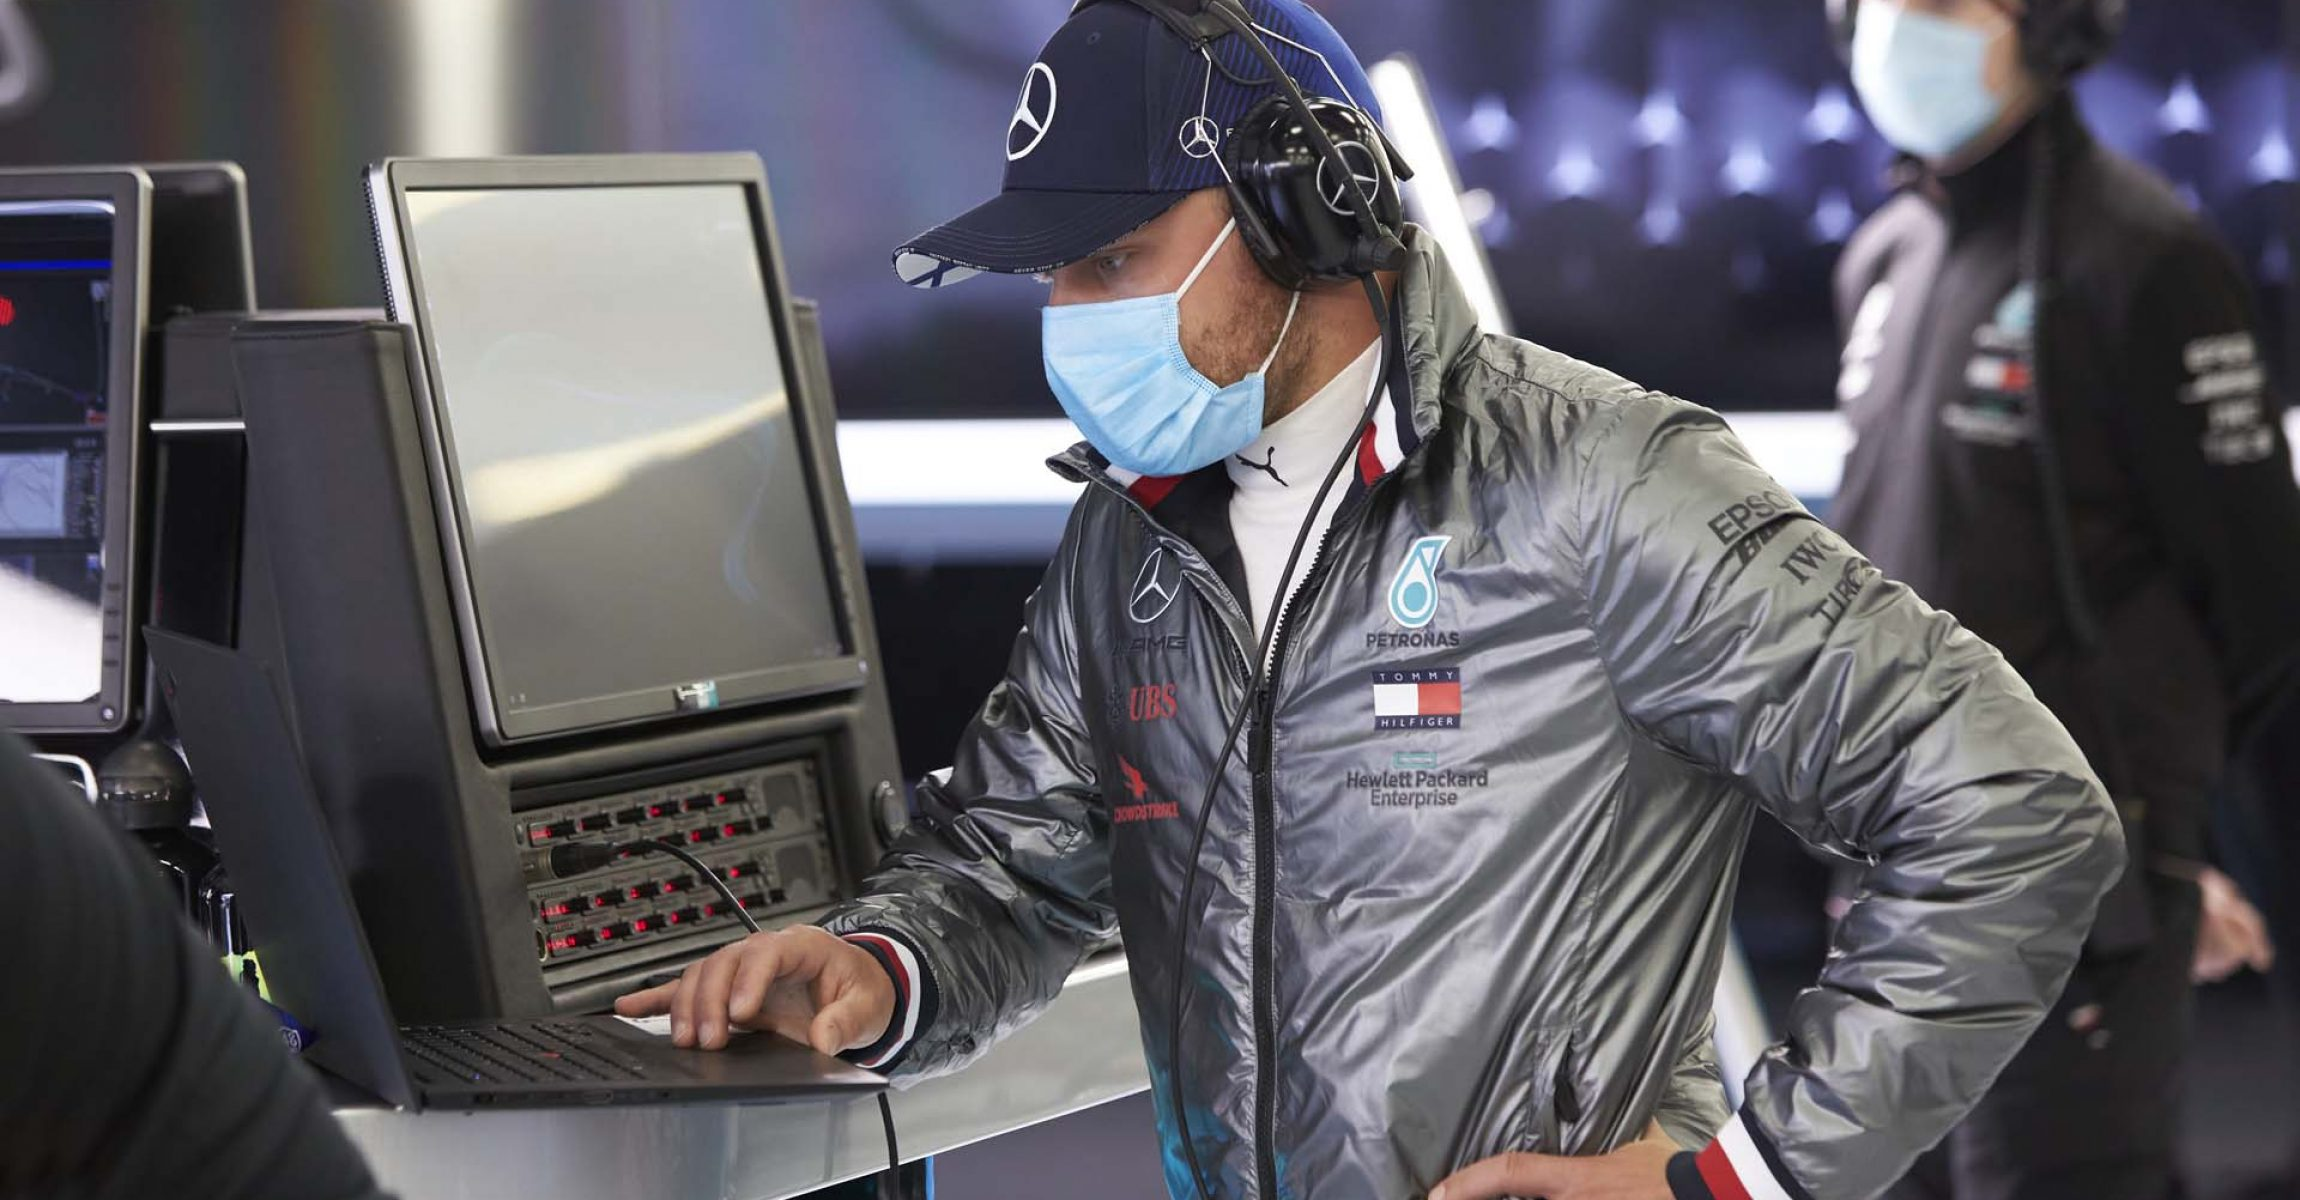 Silverstone Test, Day 1 - Steve Etherington Valtteri Bottas Mercedes